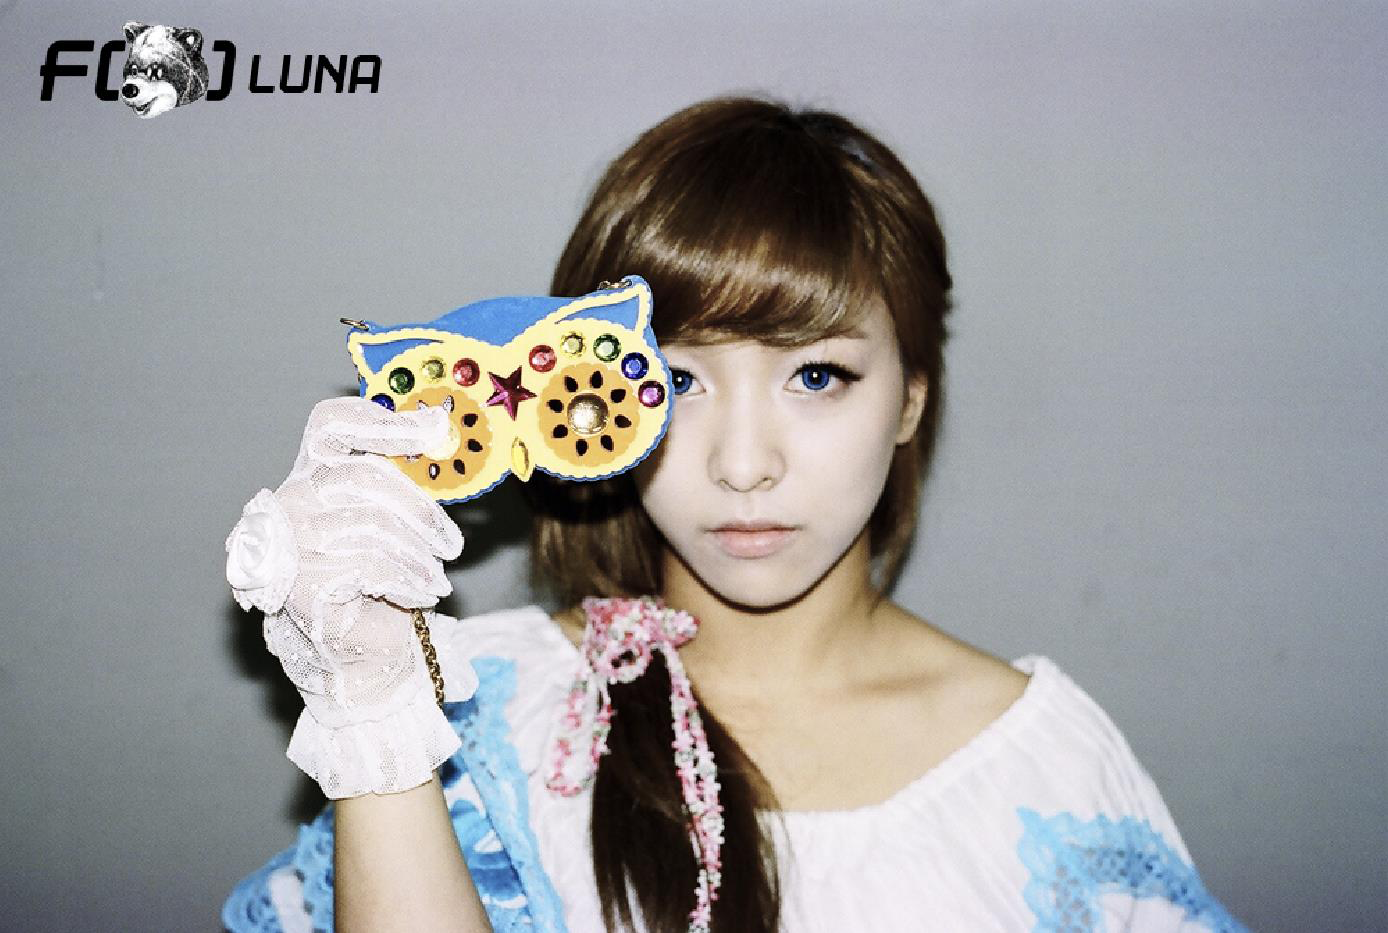 F(x) Electric Shock Luna teaser photo.png